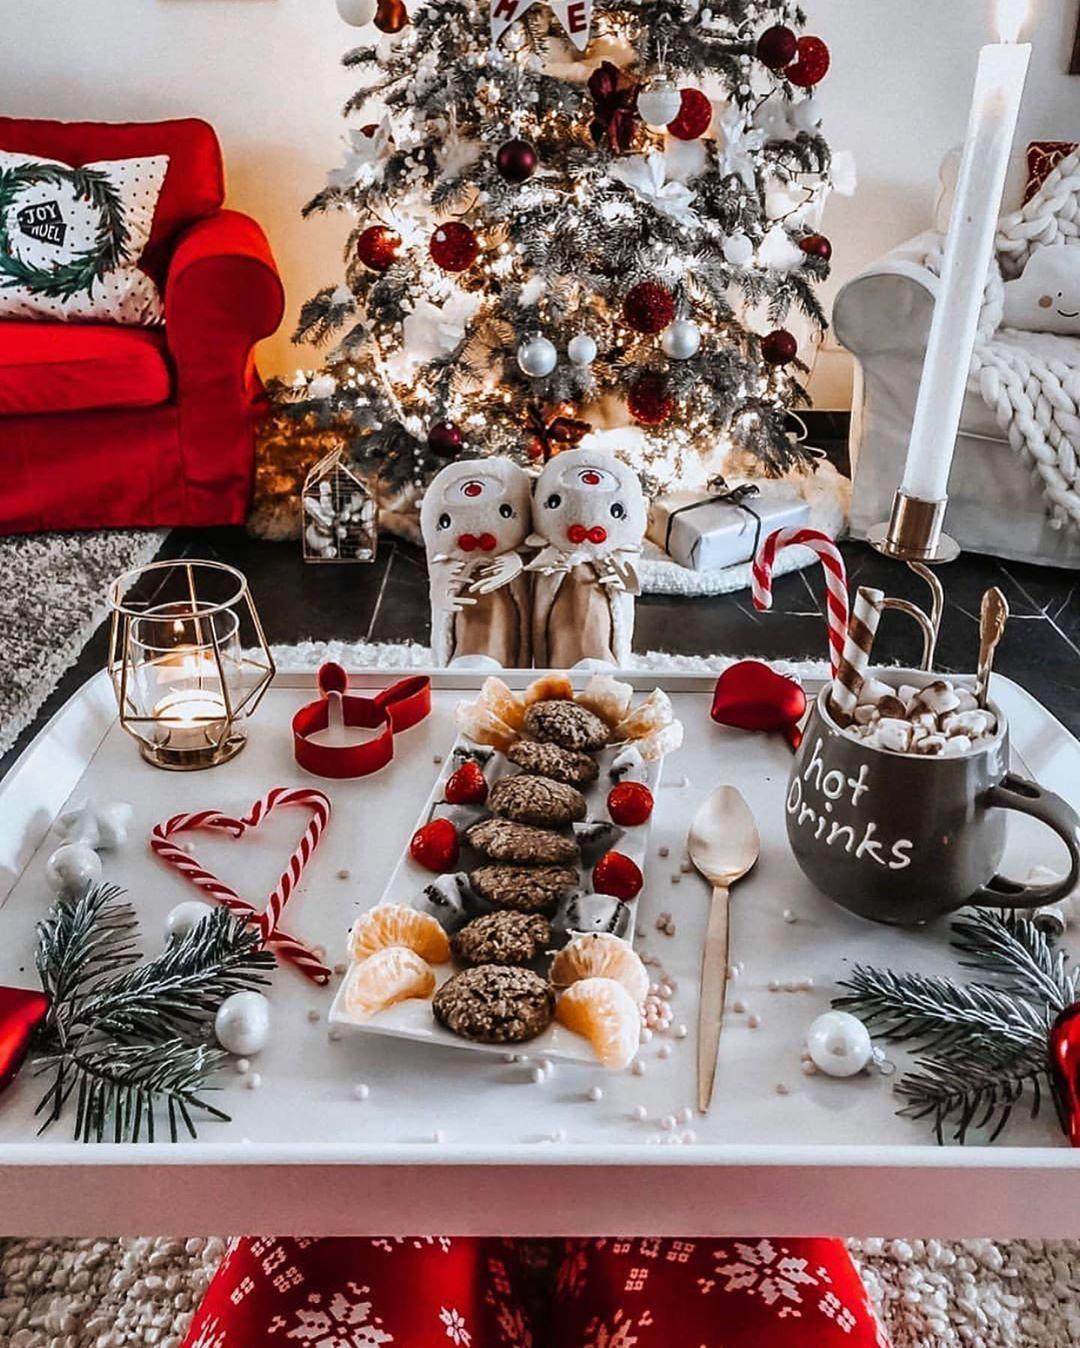 "Santa Claus on Instagram: ""110 DAYS LEFT UNTIL CHRISTMAS😍🎄🎅🎁🎉 . . . . . #christmastime #christmasmood #christmasvibes #christmaslove  #christmaslights #lights…"" -  Cozy Christmas vibes #christmastime #christmasmood #christmasvibes #christmaslove   - #Christmas #christmaslights #christmaslove #christmasmood #christmastime #christmasvibes #Claus #days #Instagram #LEFT #Lights #Santa #winterfood #winterforest #winterideas #wintermood"